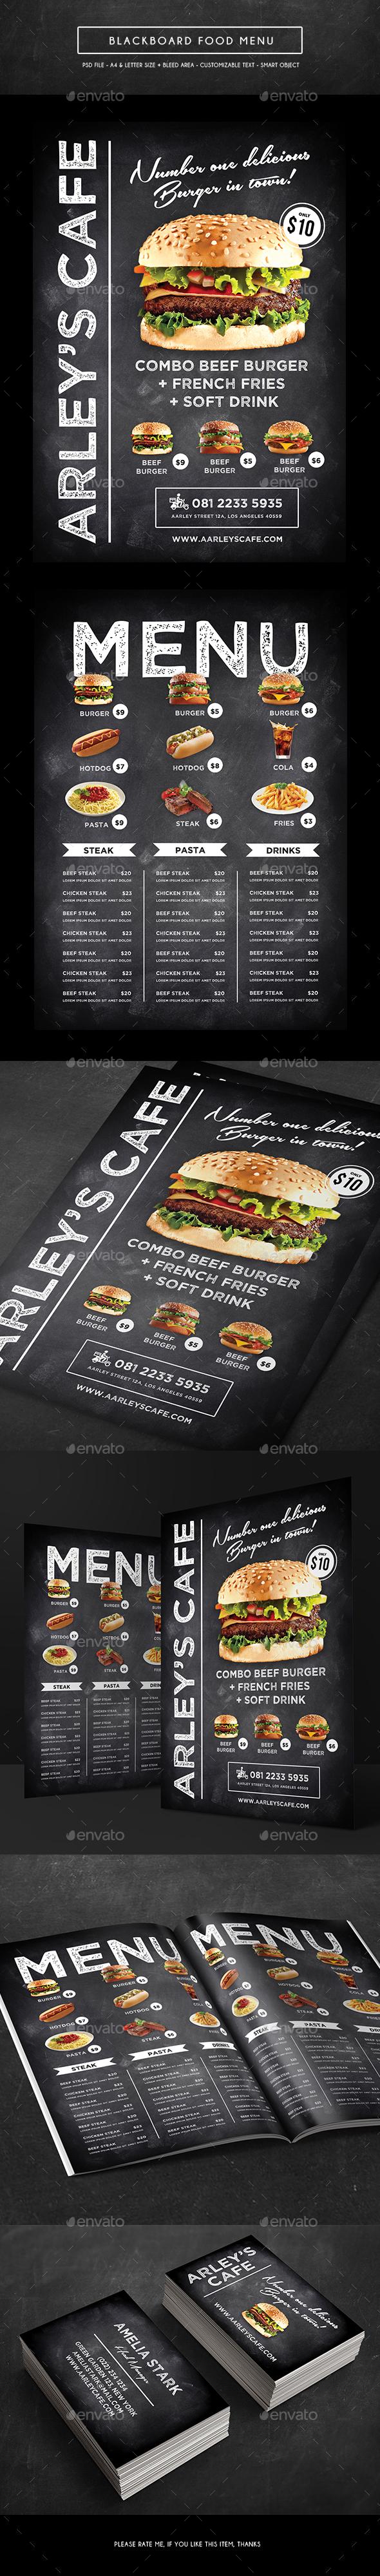 Blackboard Menu + Business Card - Food Menus Print Templates